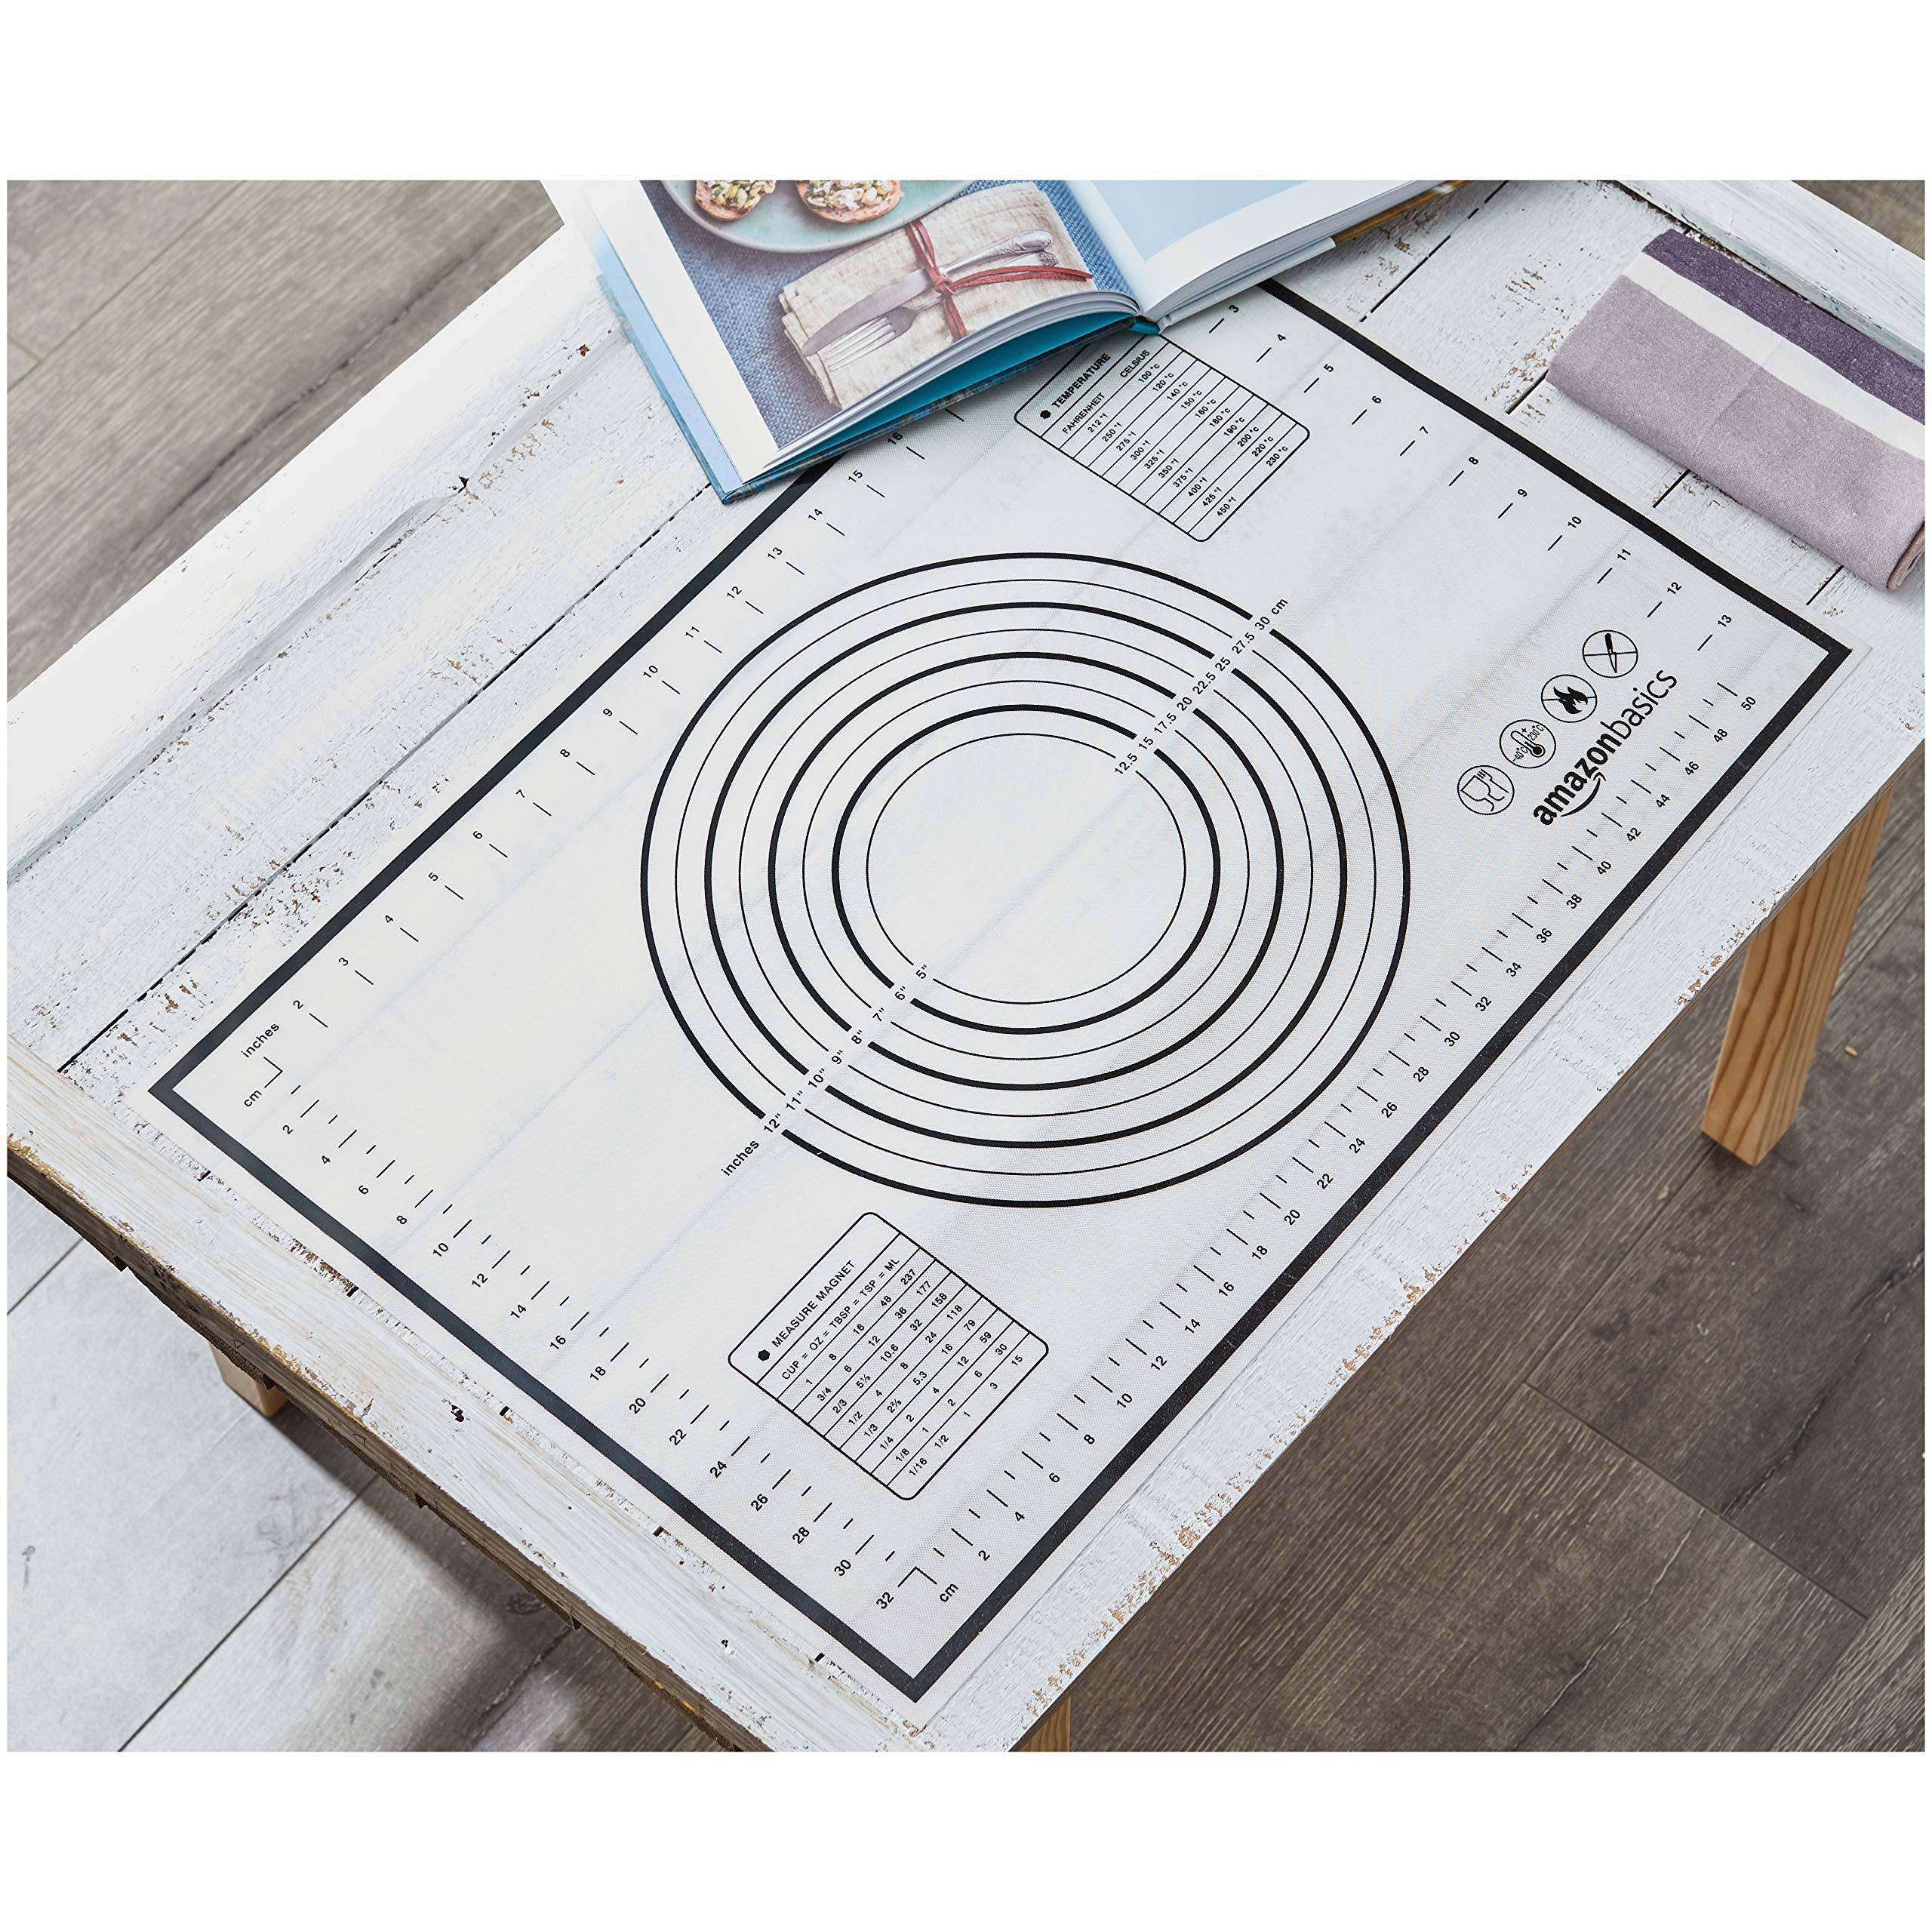 AmazonBasics - Tapete de silicona para amasar y hornear 60 x 40 cm ...